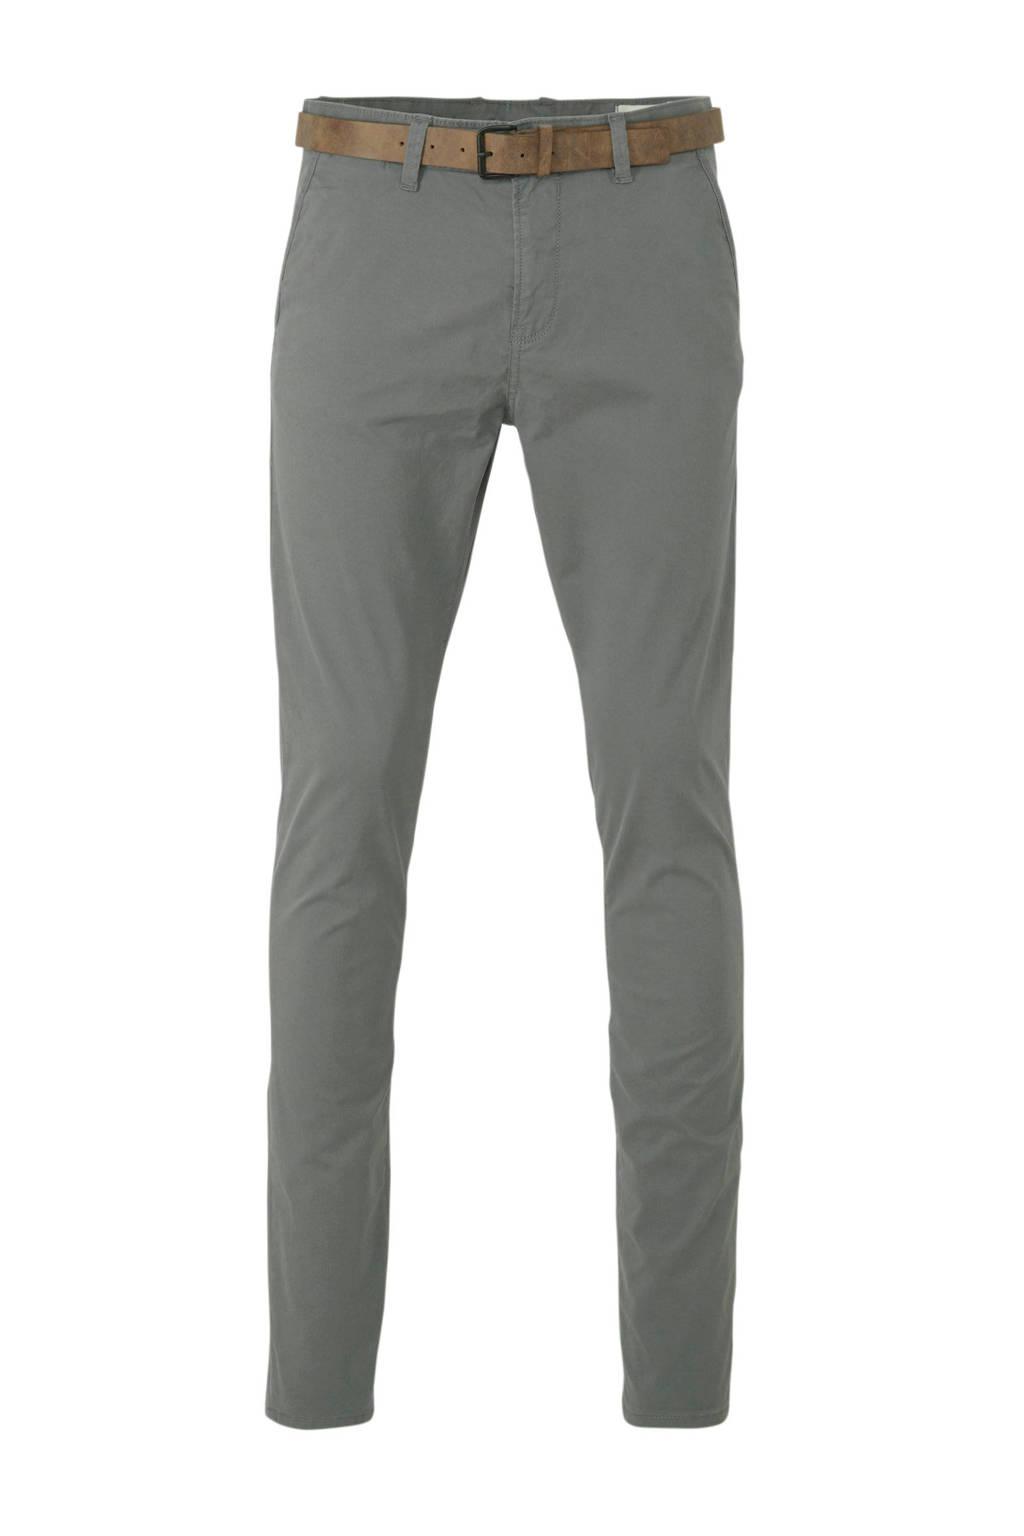 Tom Tailor slim fit chino castlerock grey, Castlerock Grey